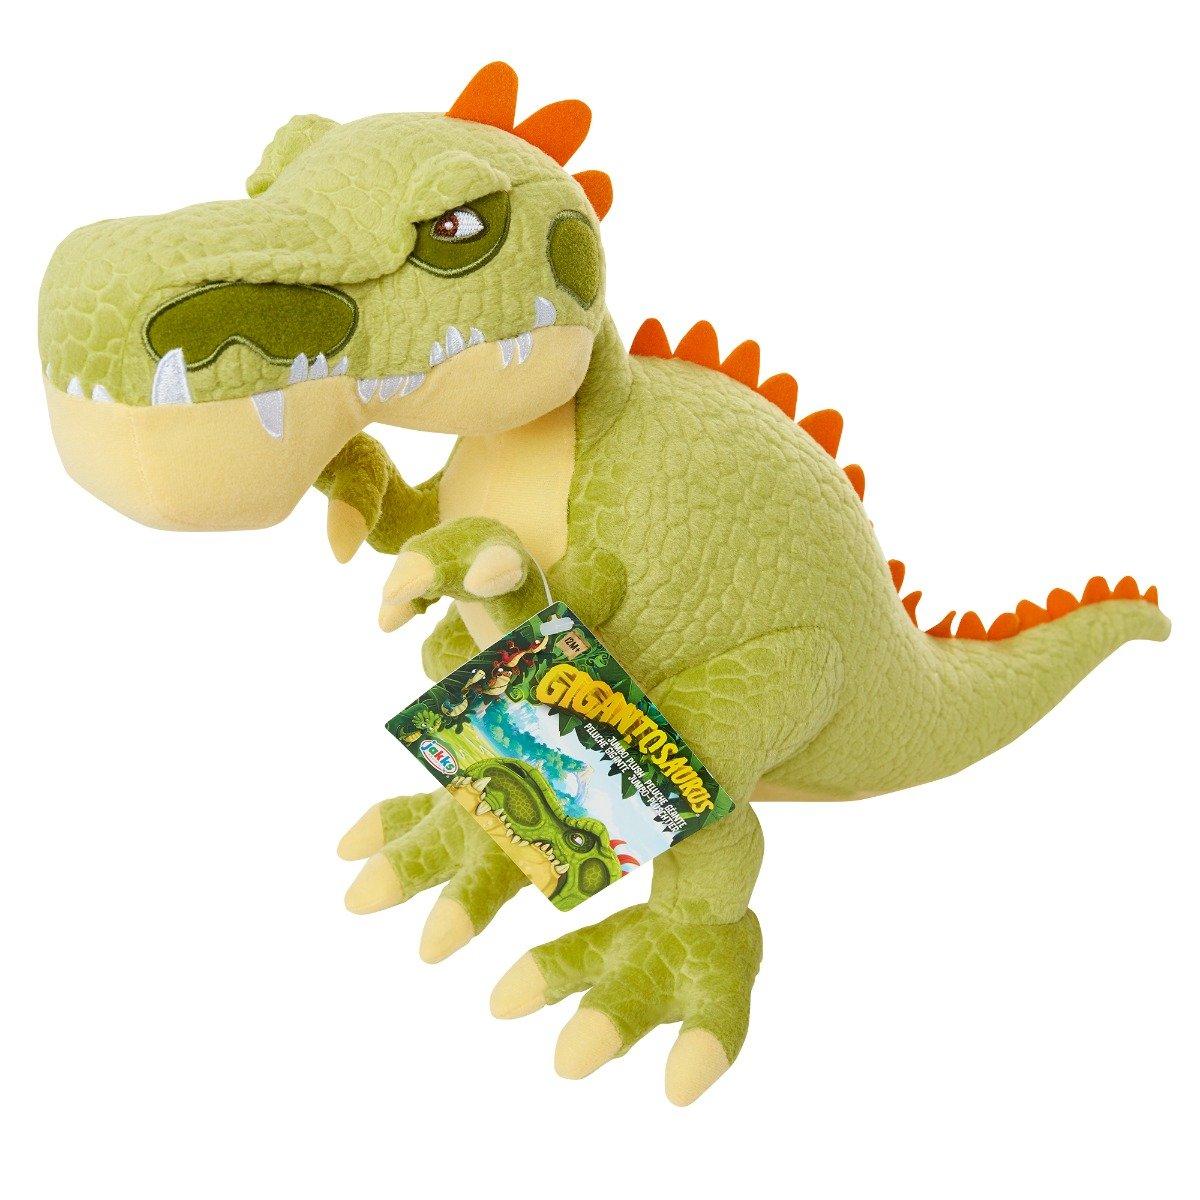 Jucarie de plus dinozaur Gigantosaurus, Giganto Jumbo